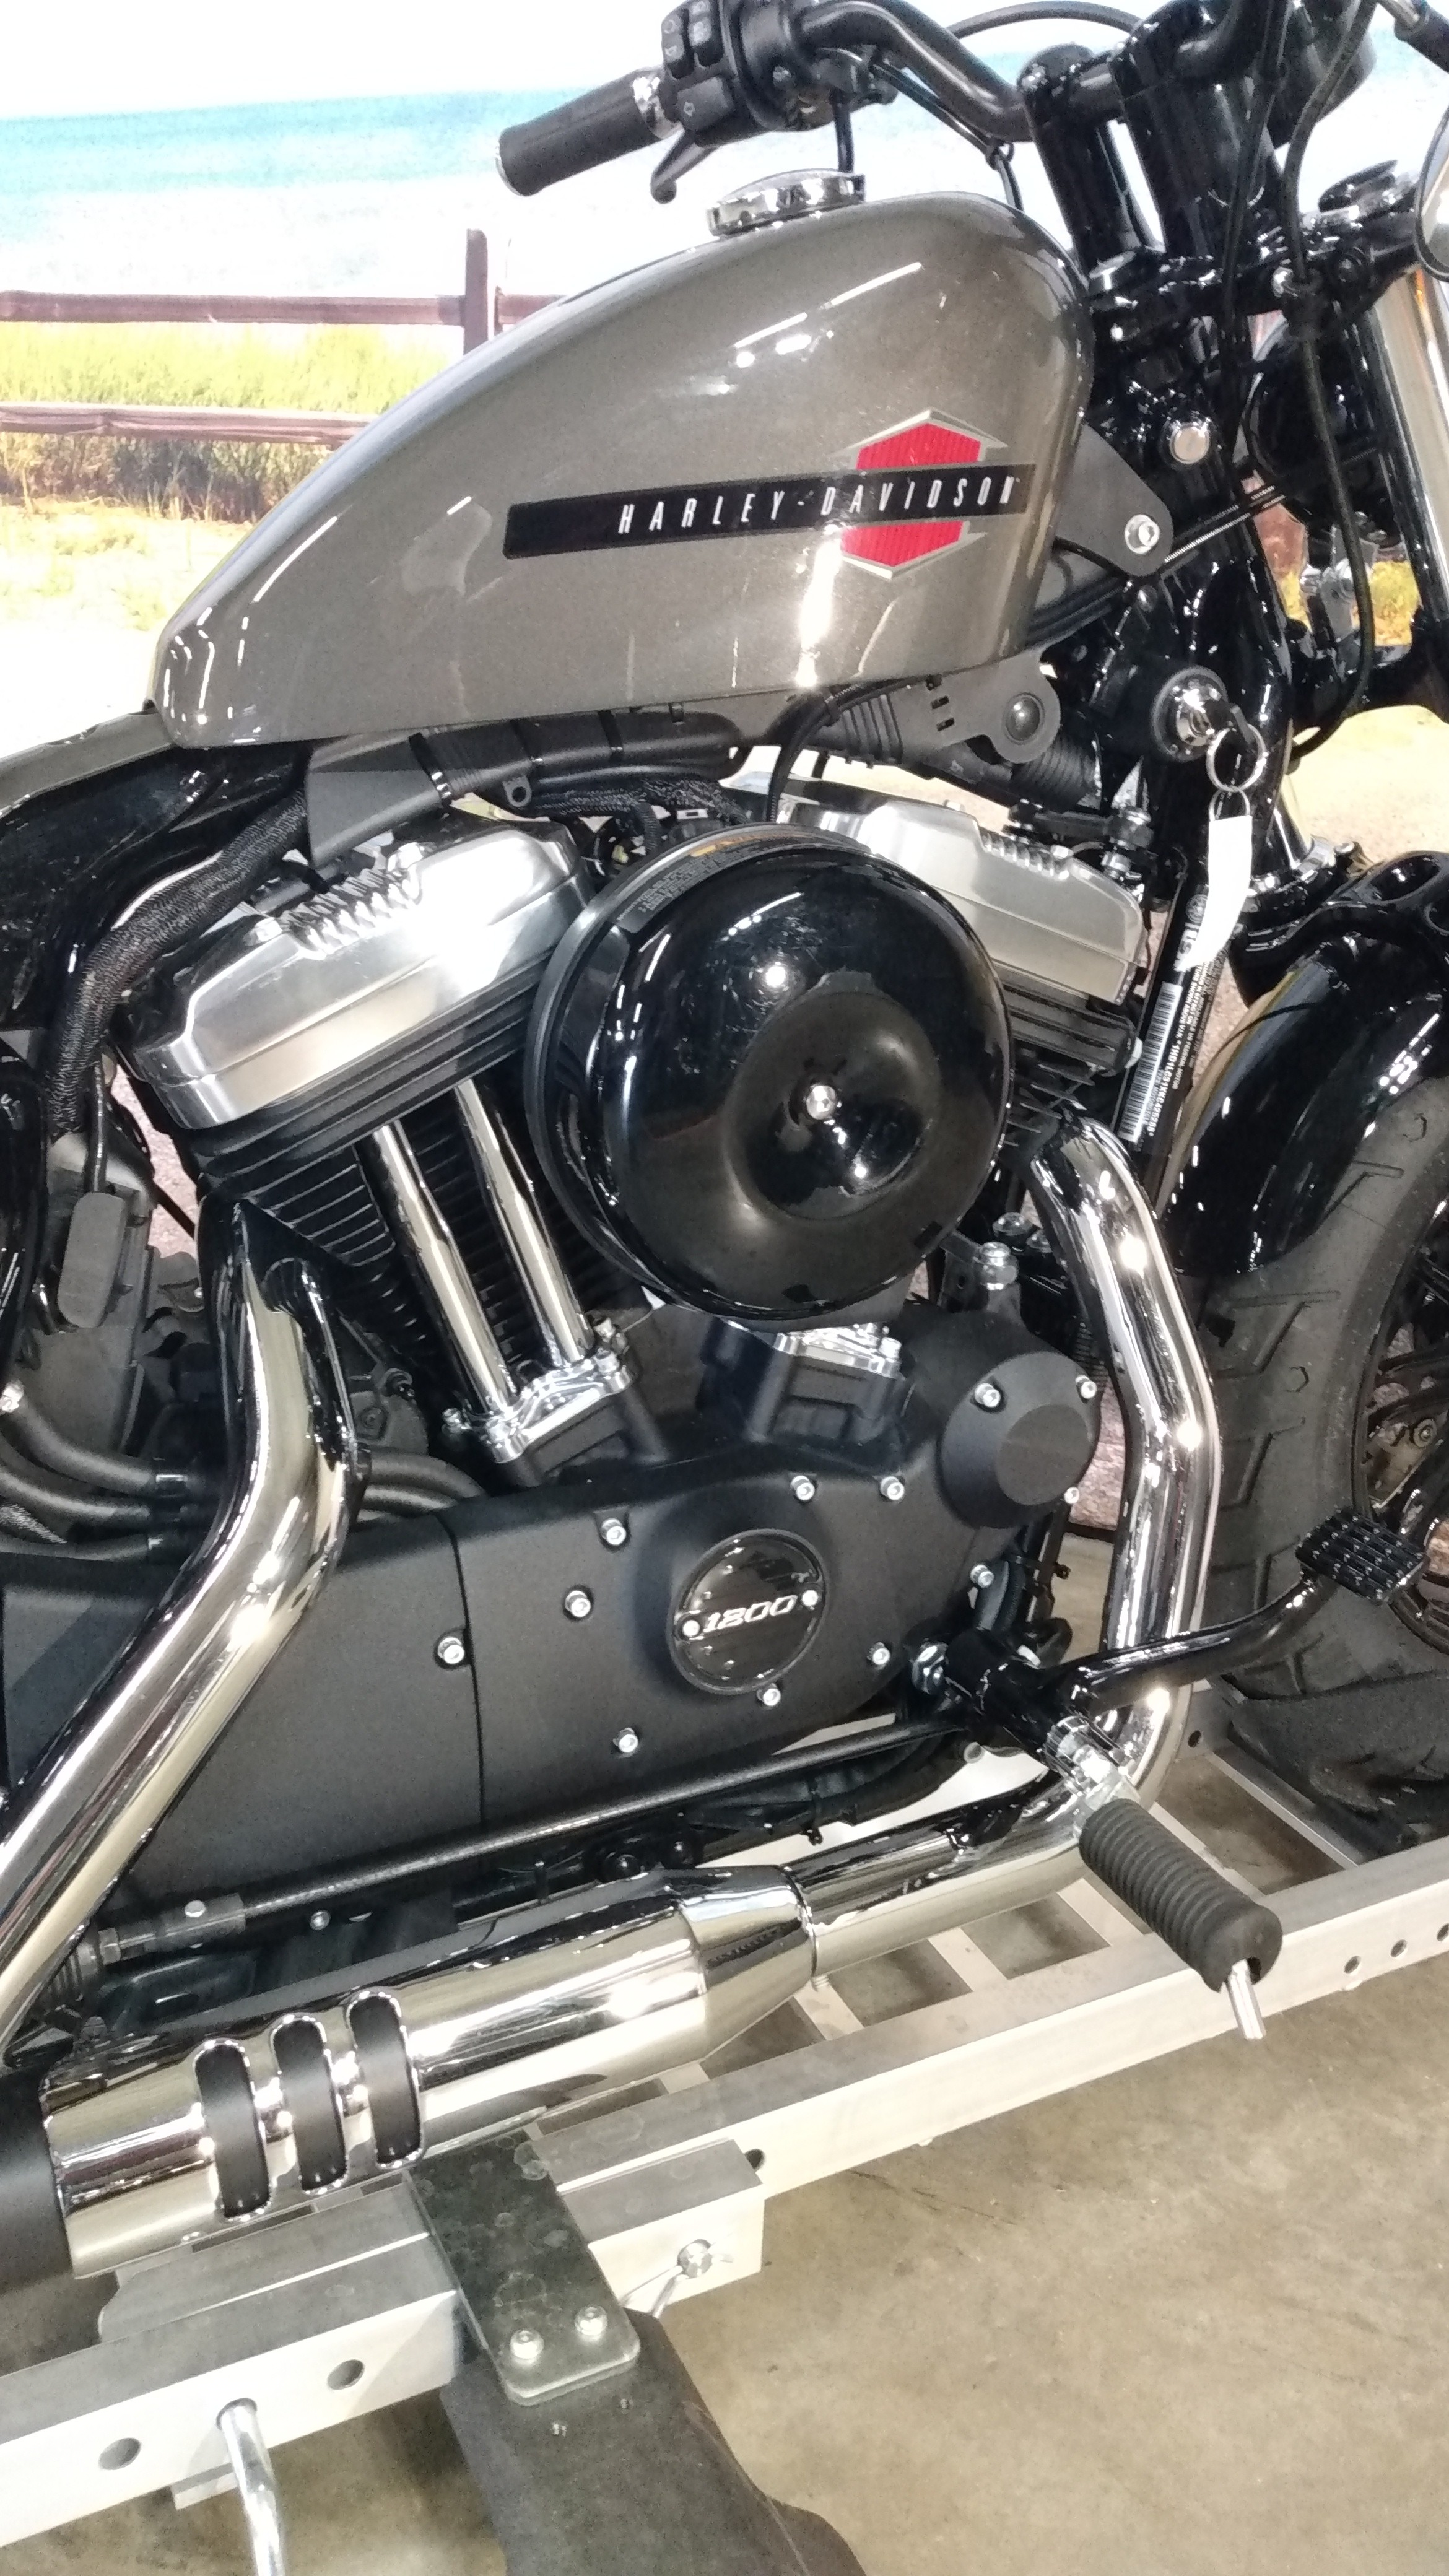 2019 Harley-Davidson Sportster Forty-Eight at Hot Rod Harley-Davidson